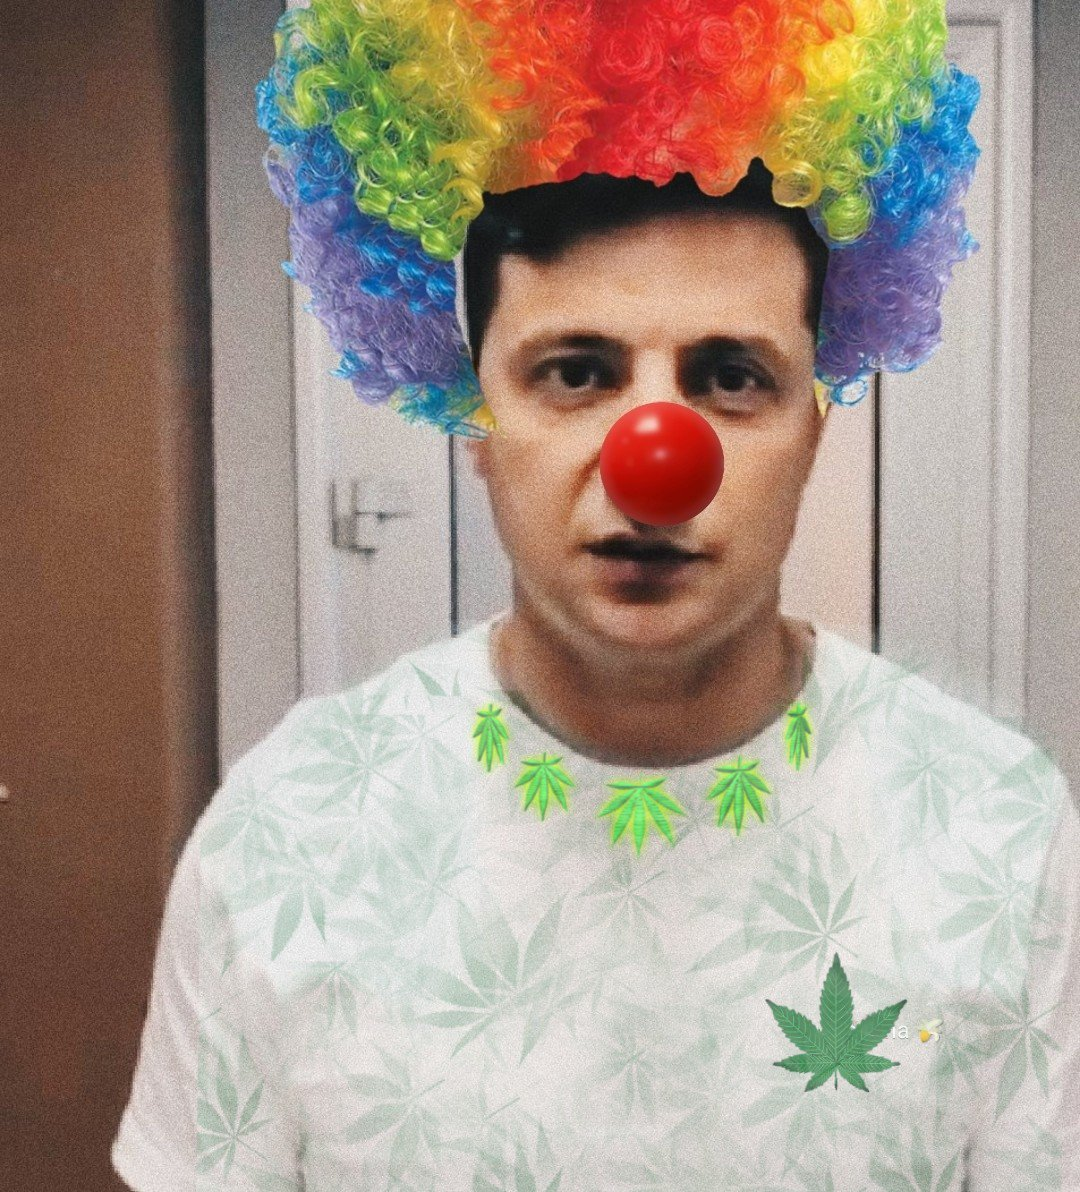 Зеленский клоун демотиватор